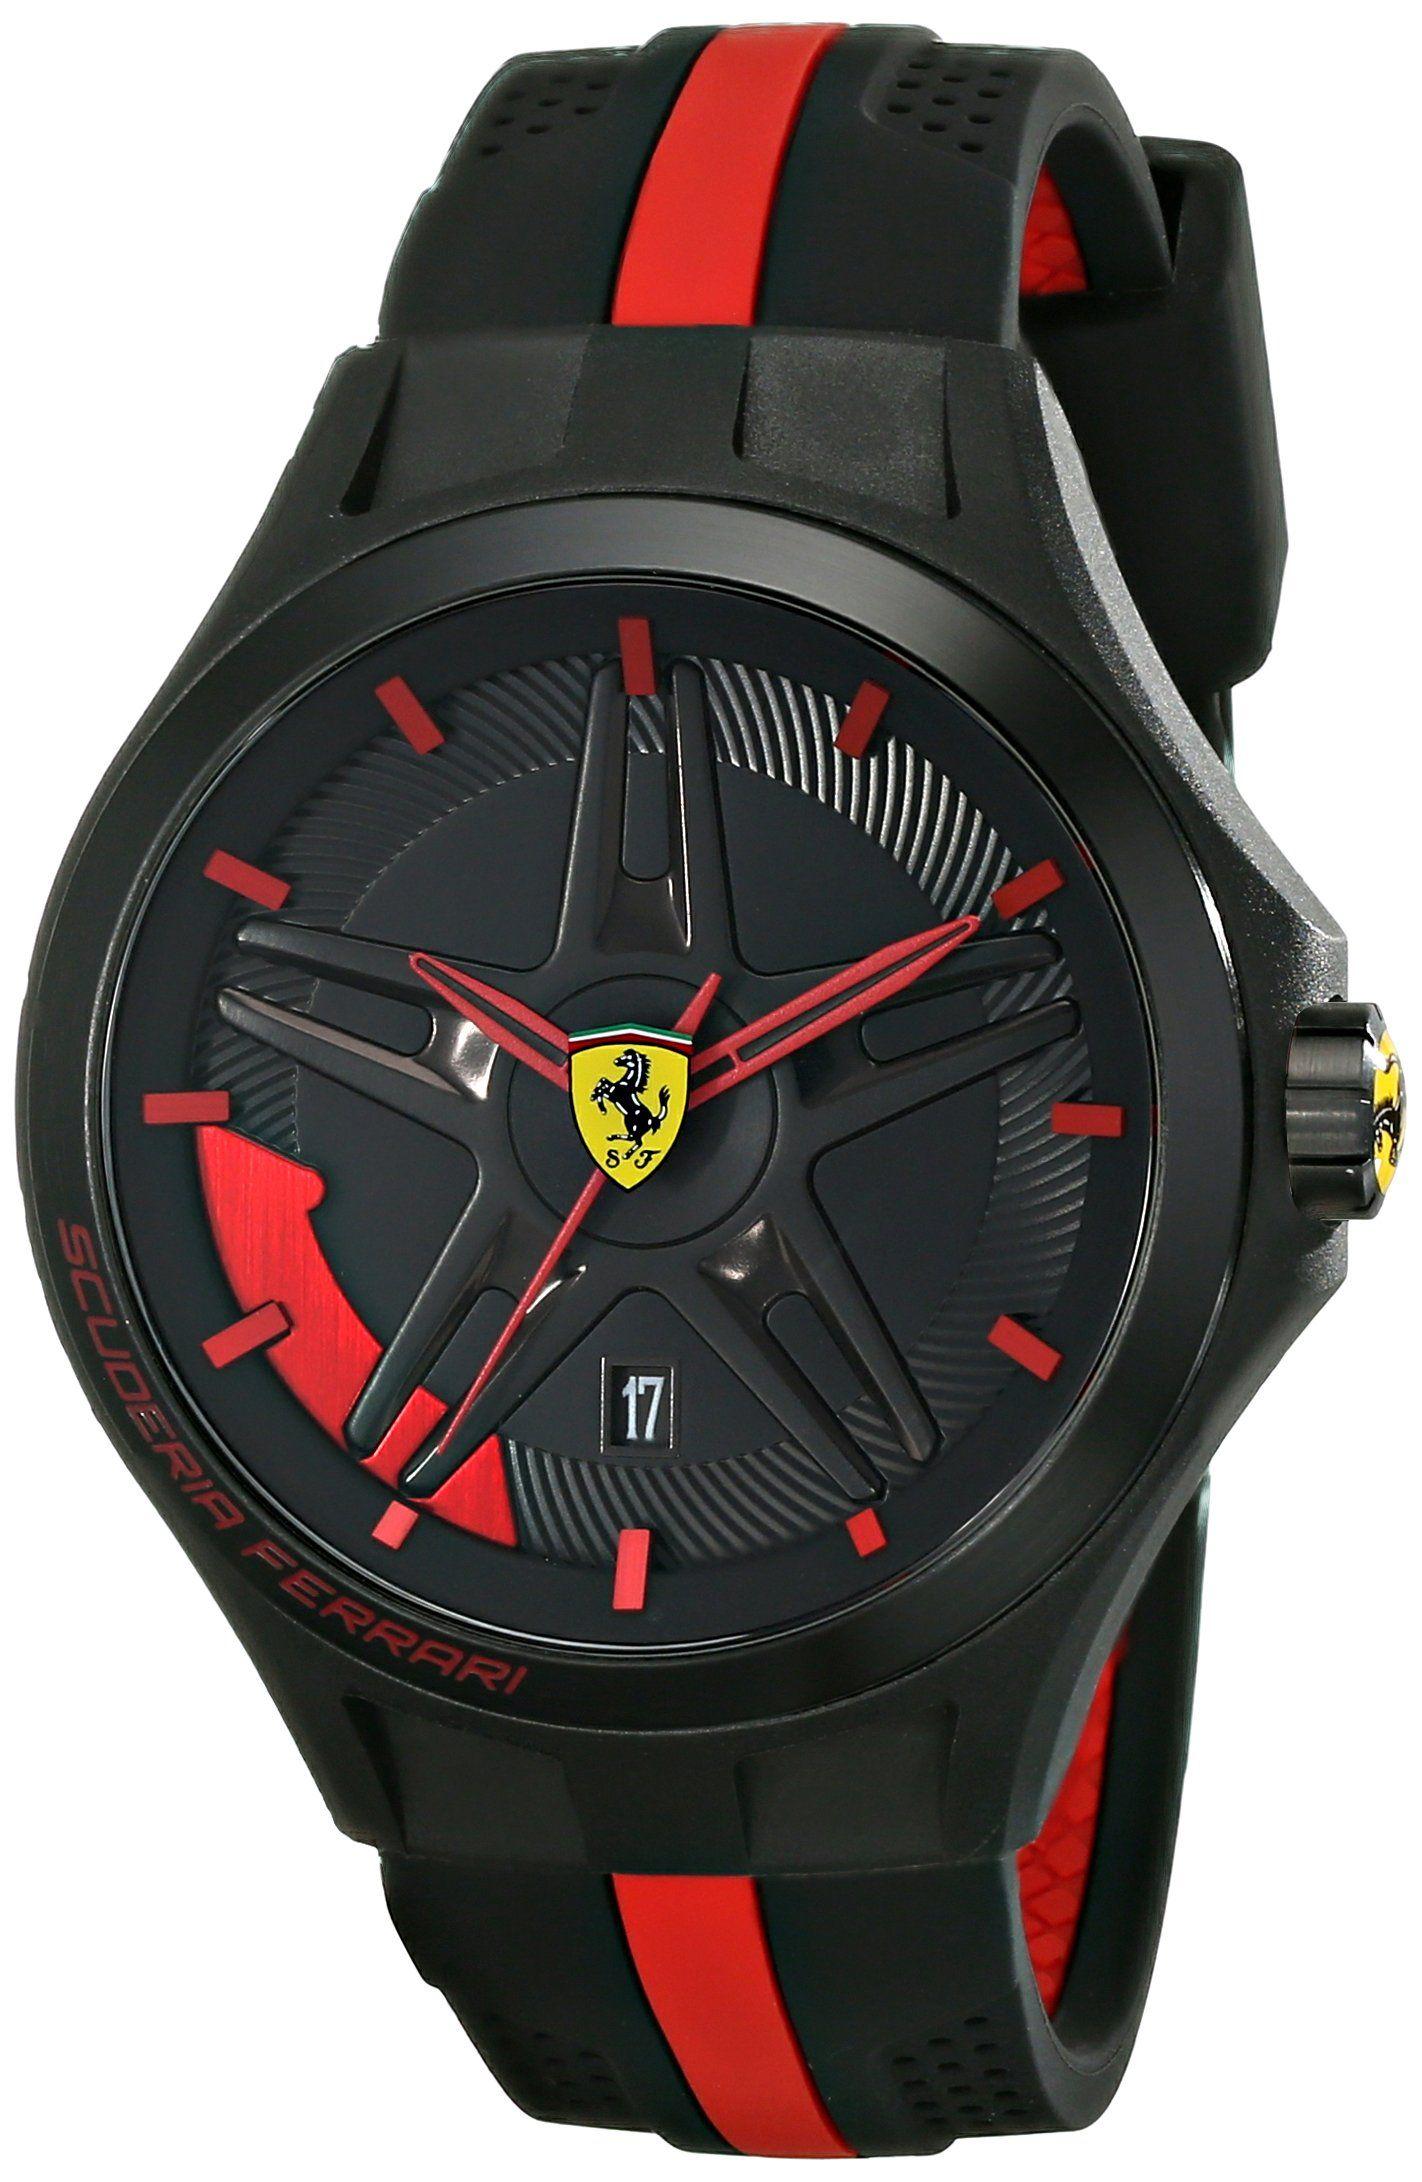 Amazon Com Ferrari Men S 0830160 Lap Time Black And Red Watch Ferrari Watches Ferrari Watch Watches For Men Military Watches